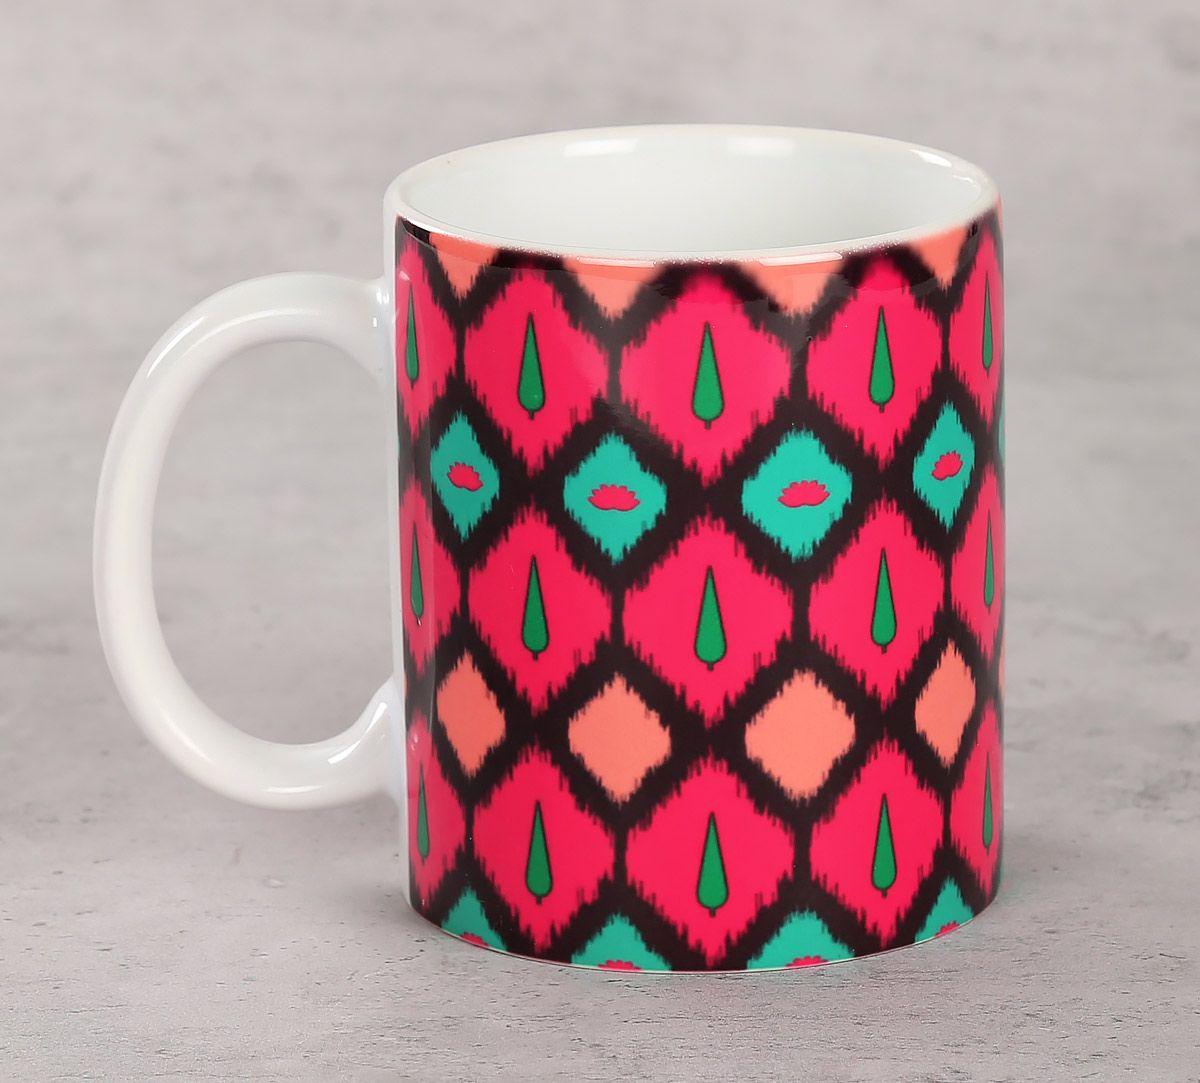 India Circus Conifer Symmetry Mug